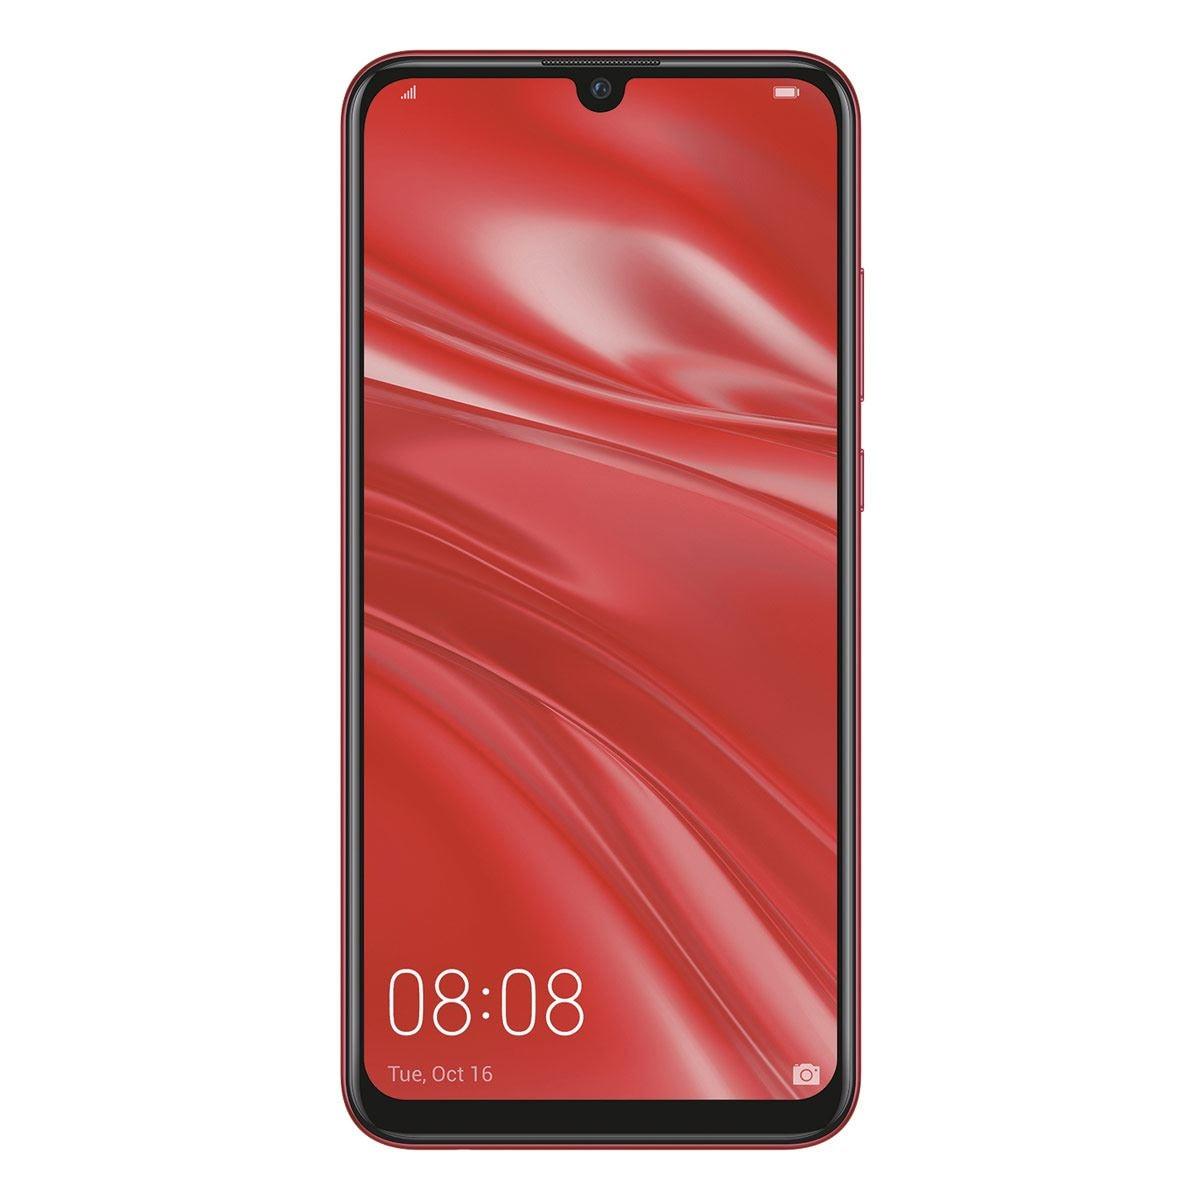 Celular Huawei POTLX3 P-SMART 2019 Color Rojo R6 (Telcel)